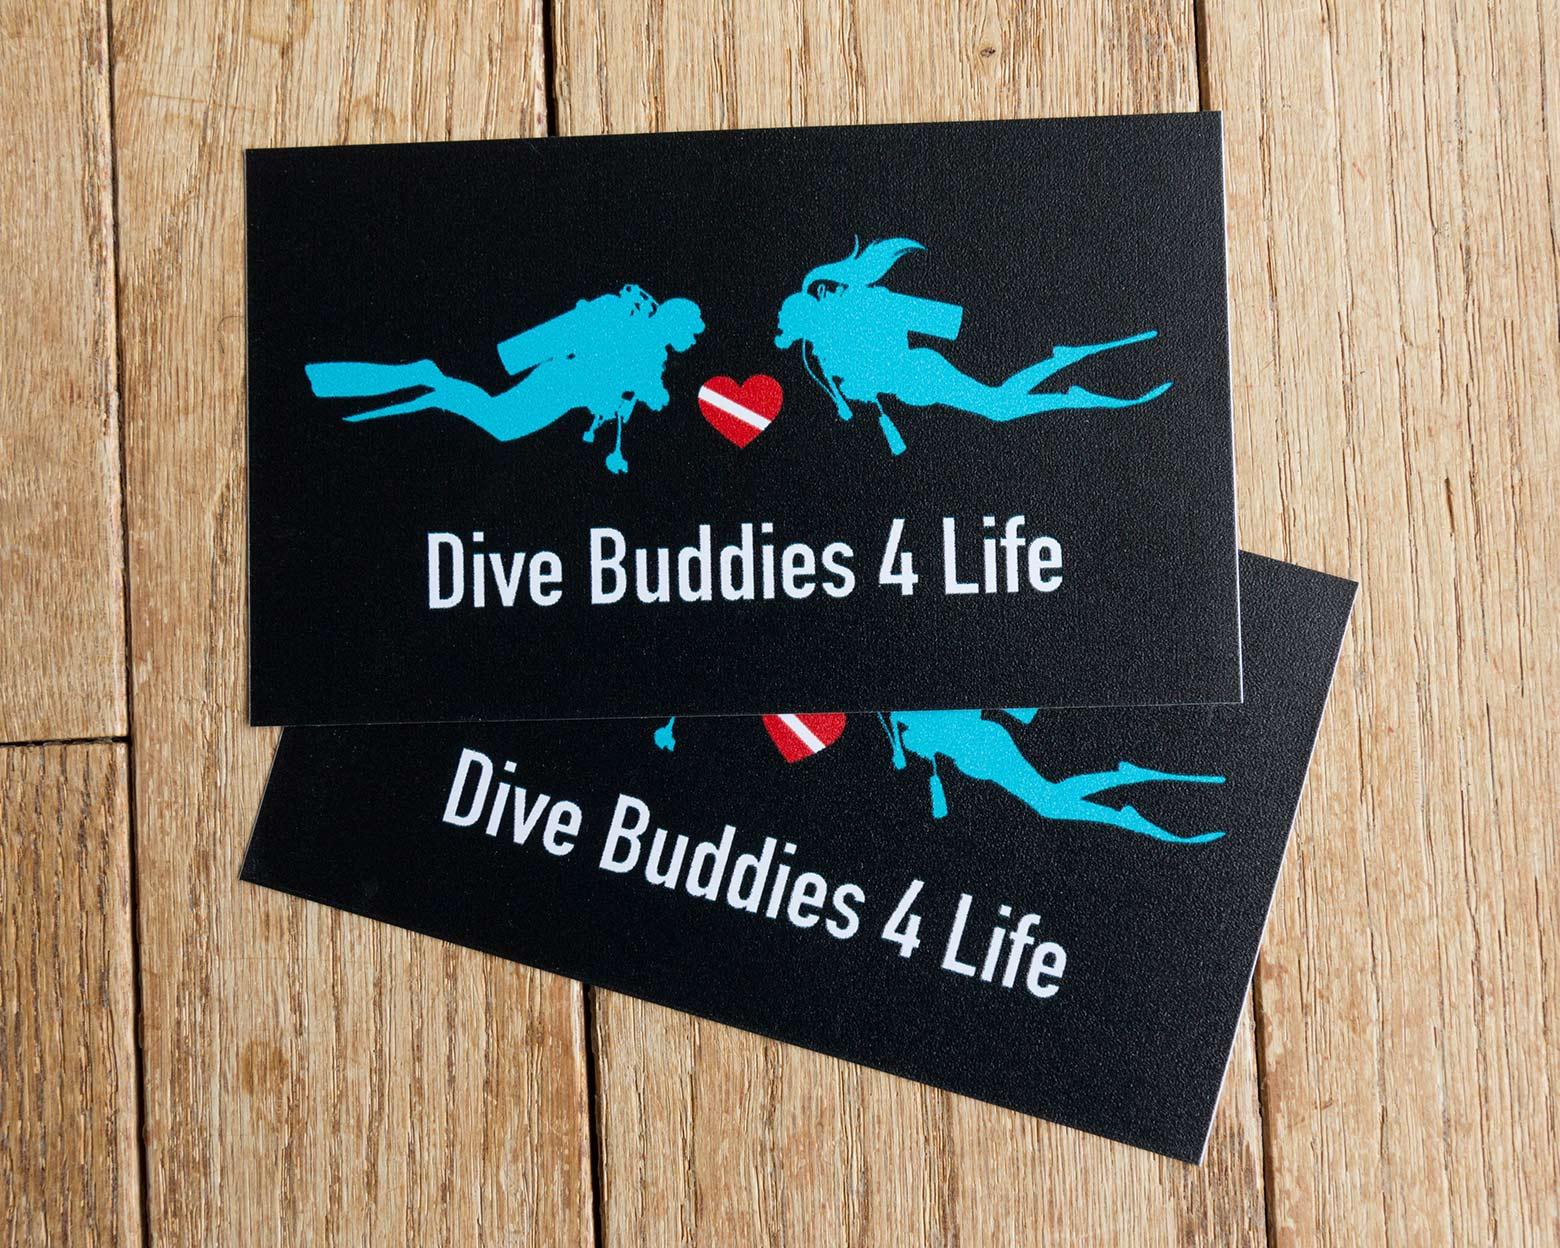 Dive Buddies 4 Life Bumper Sticker 2